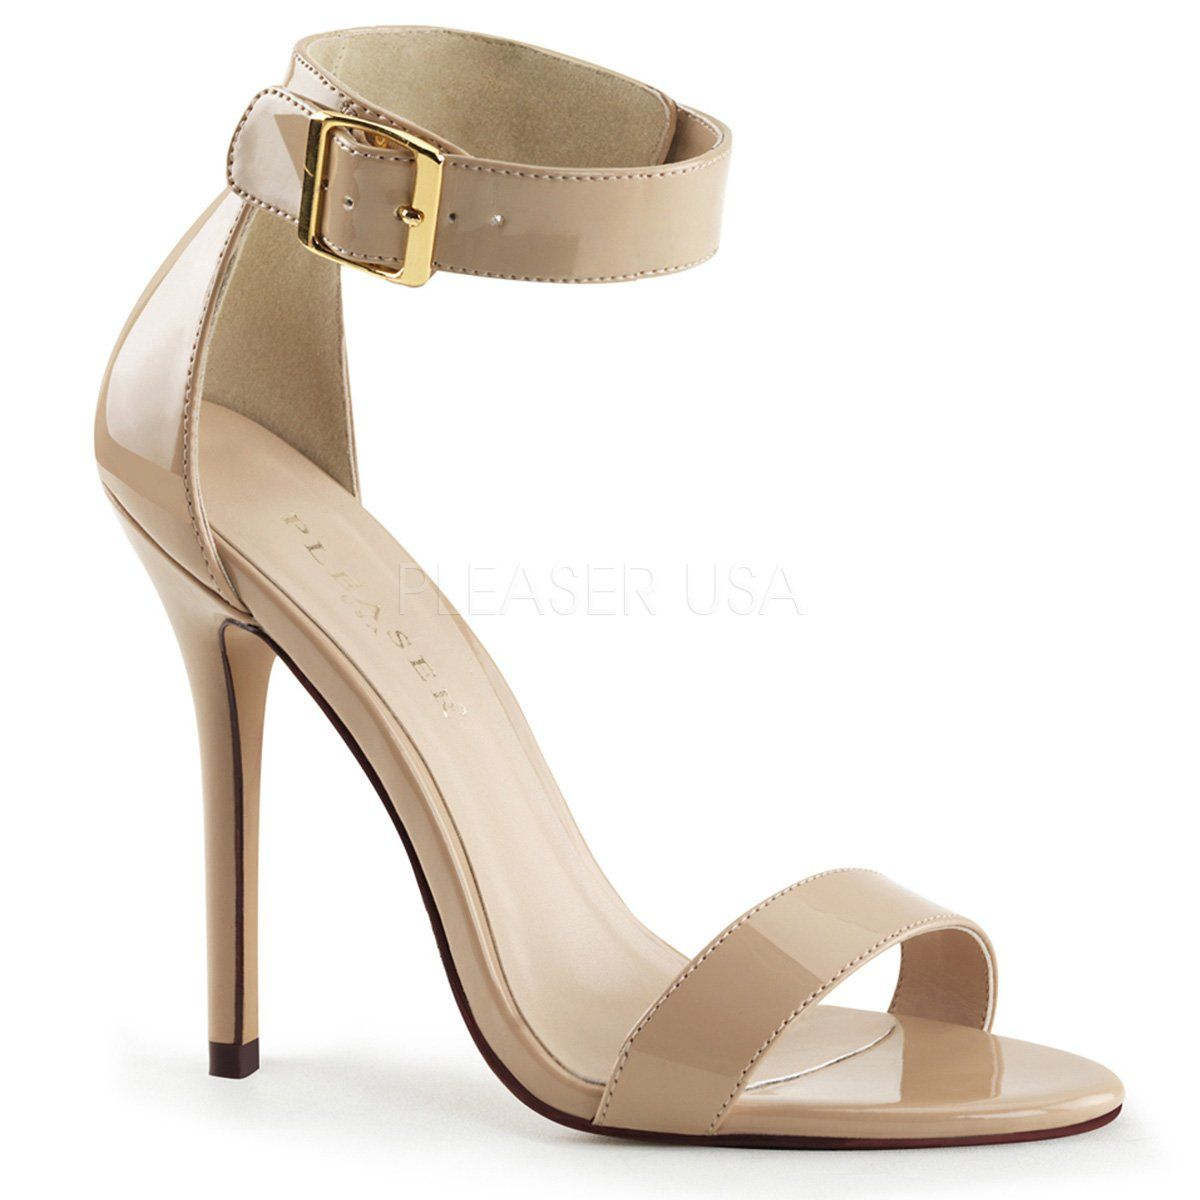 Pleaser AMUSE-10 Womens Silver Metallic Pu High Heel Open Toe Ankle Strap Sandal